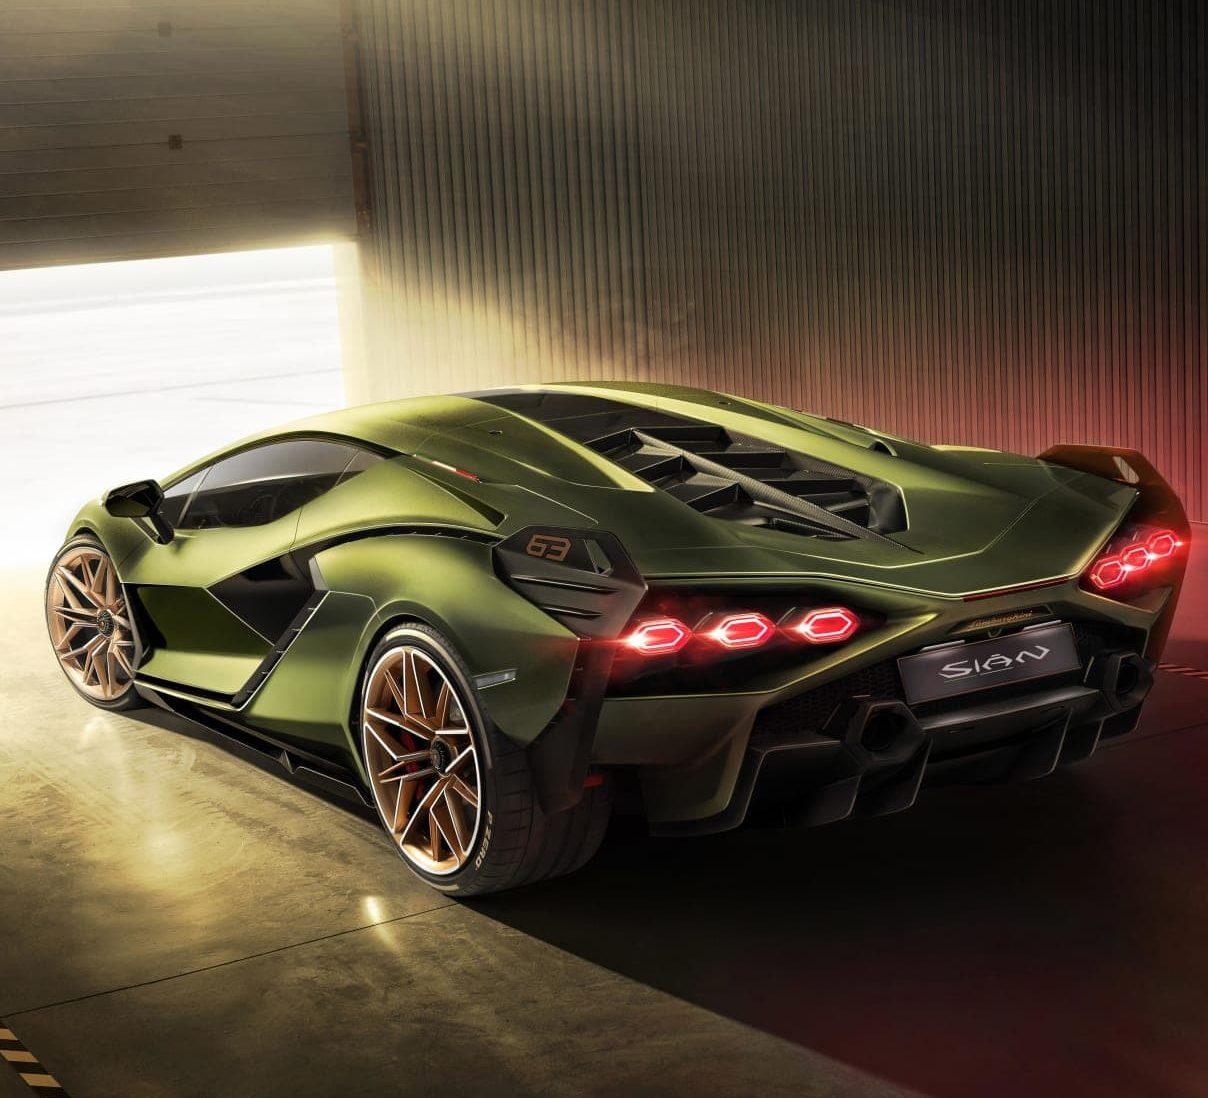 Lamborghini goes hybrid, Bugatti breaks the 300mph barrier, and more car news